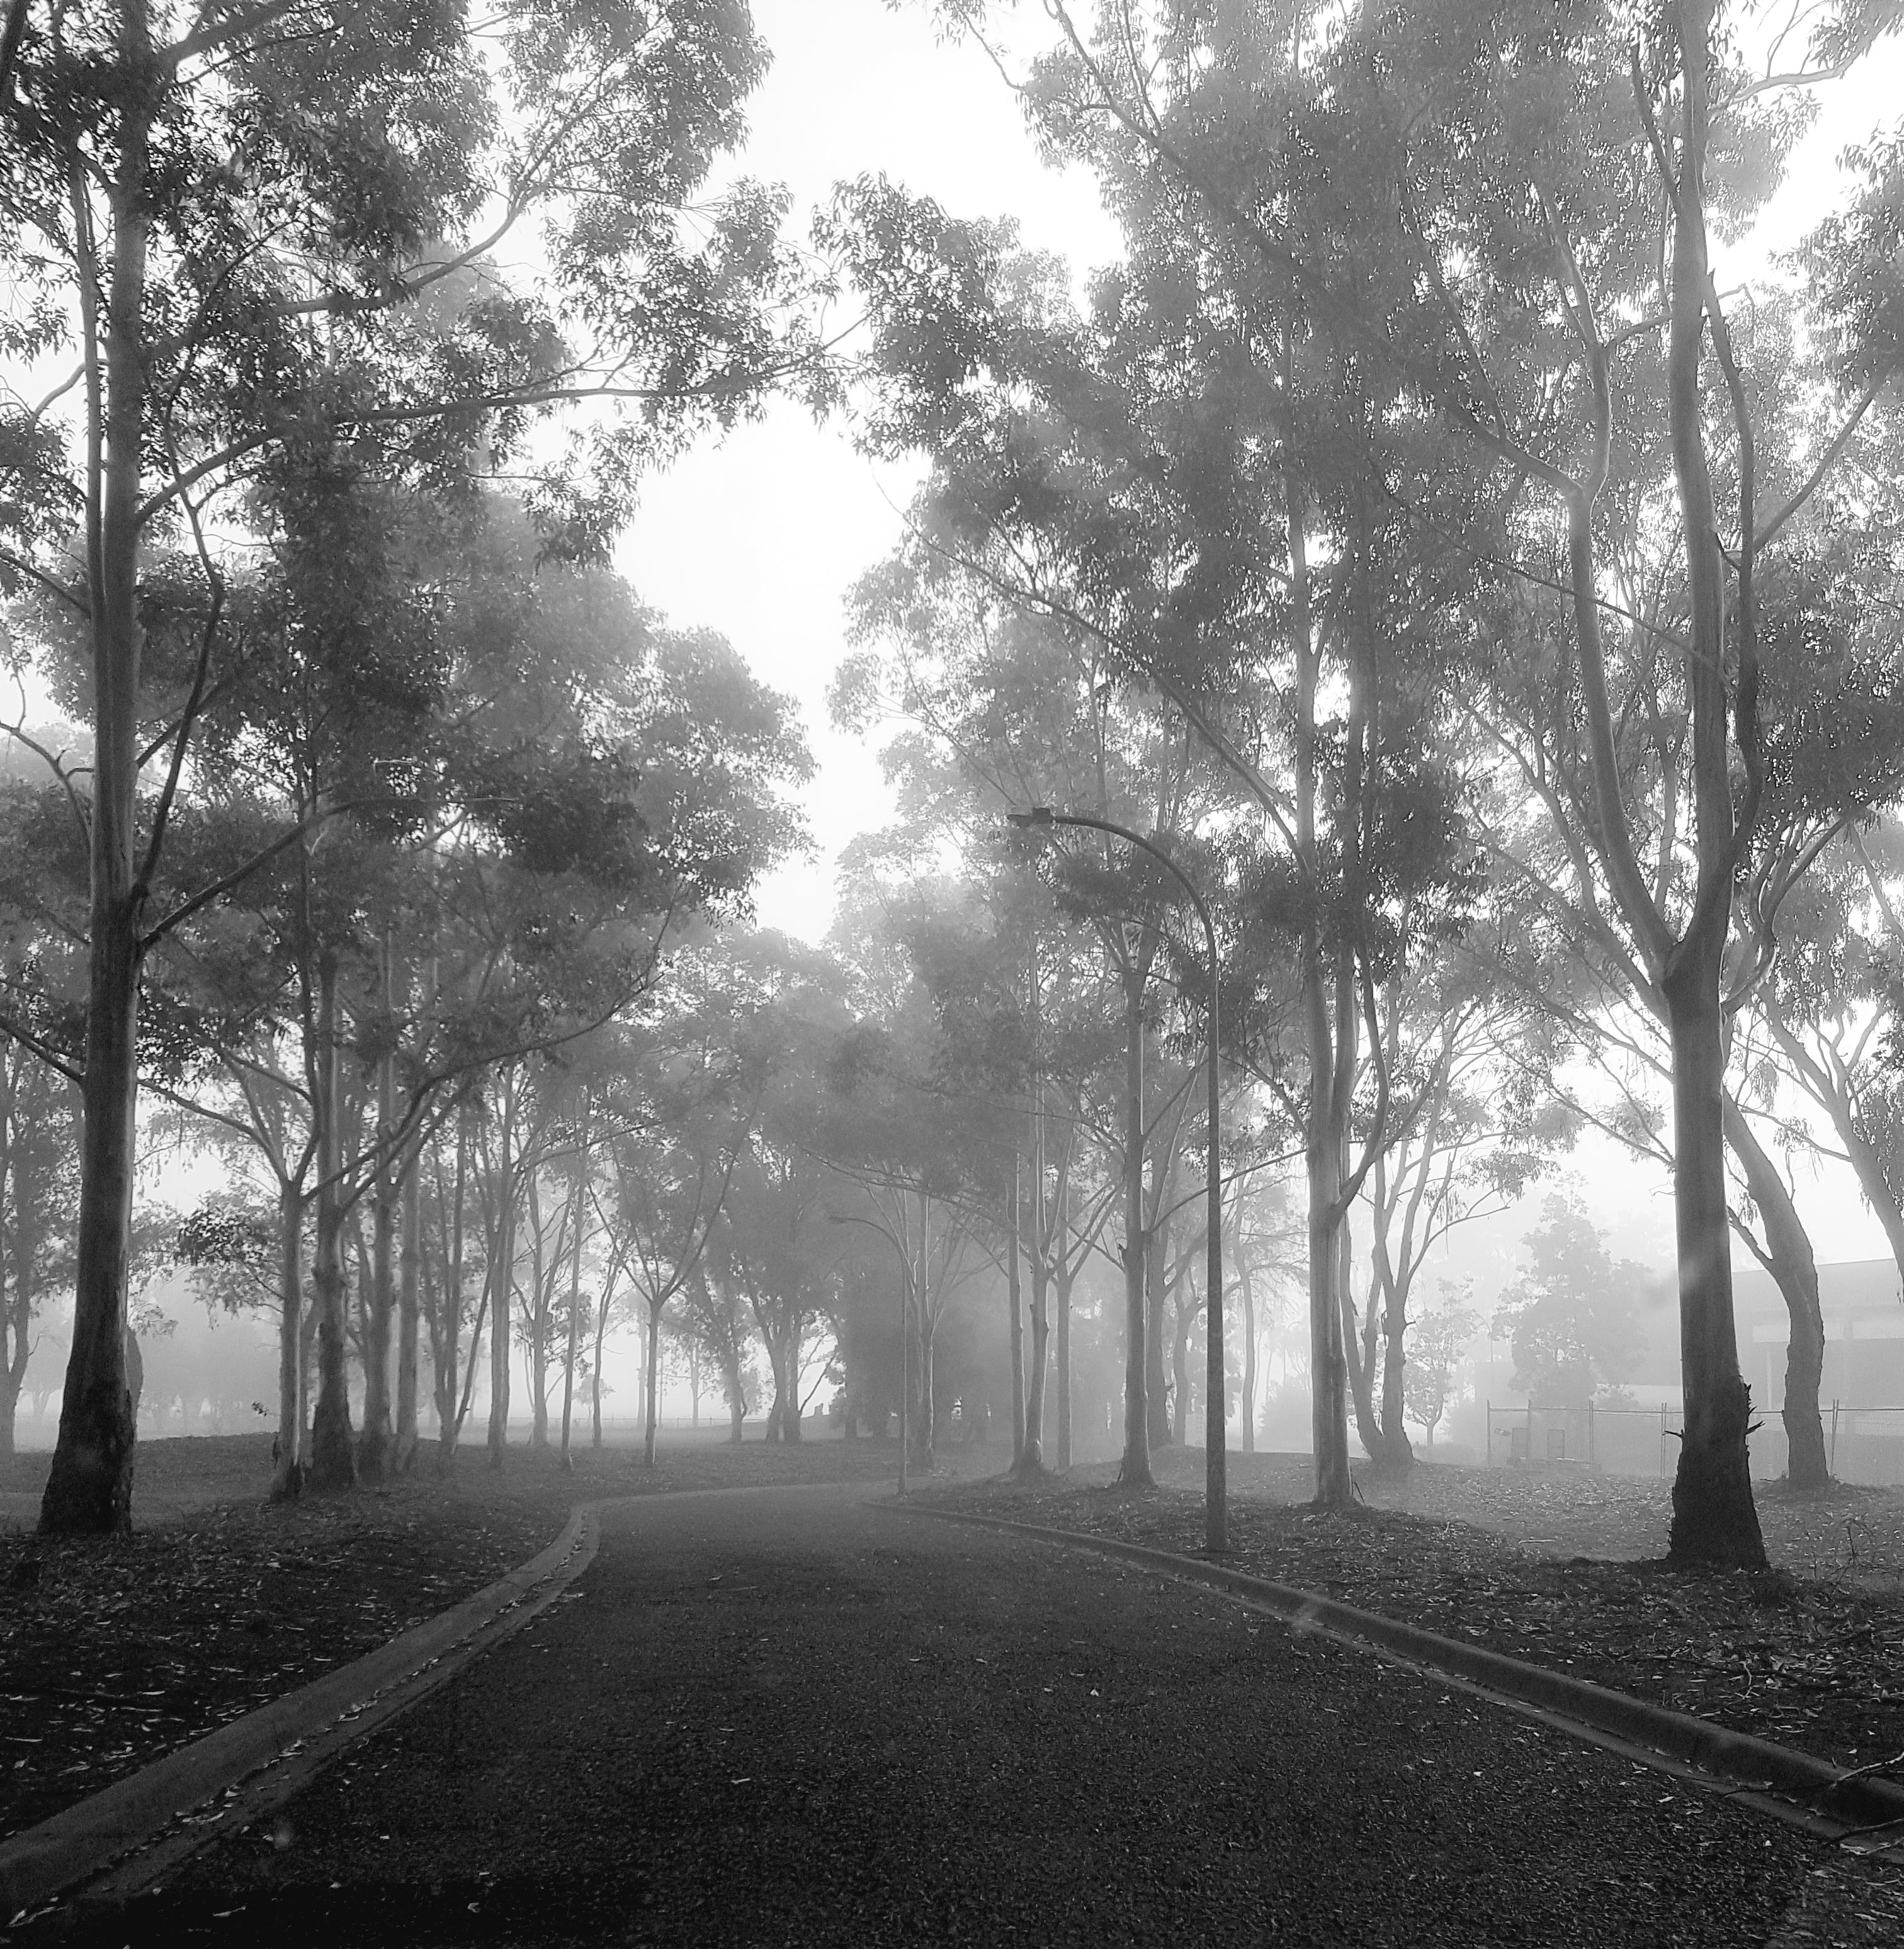 Free stock photo of black and white, driveway, fog, foggy